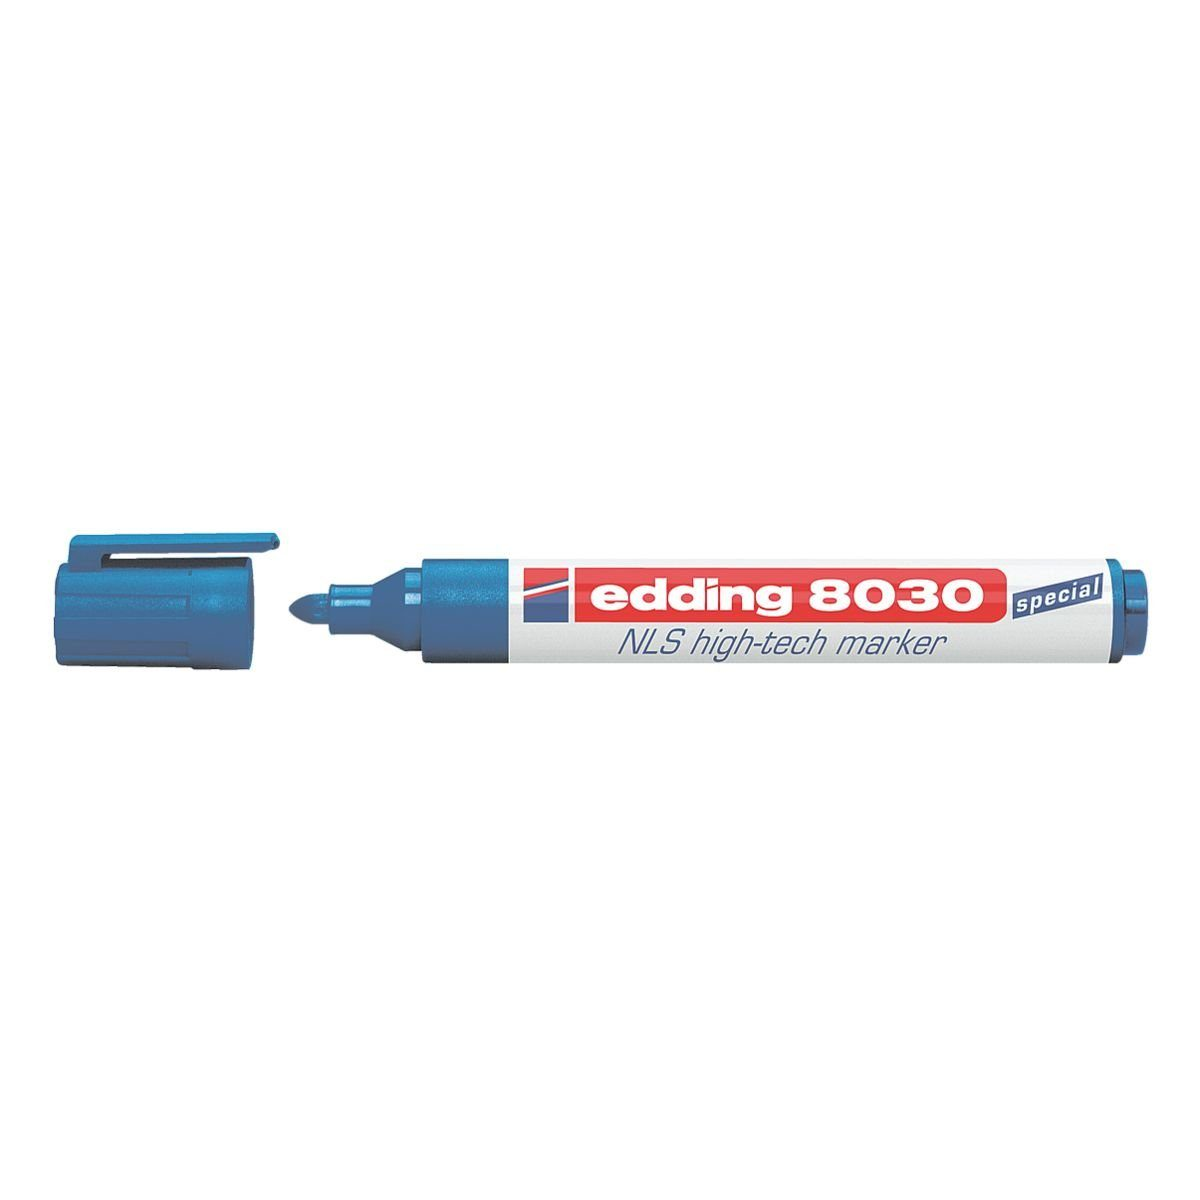 edding Spezialmarker »8030 NLS high-tech marker«